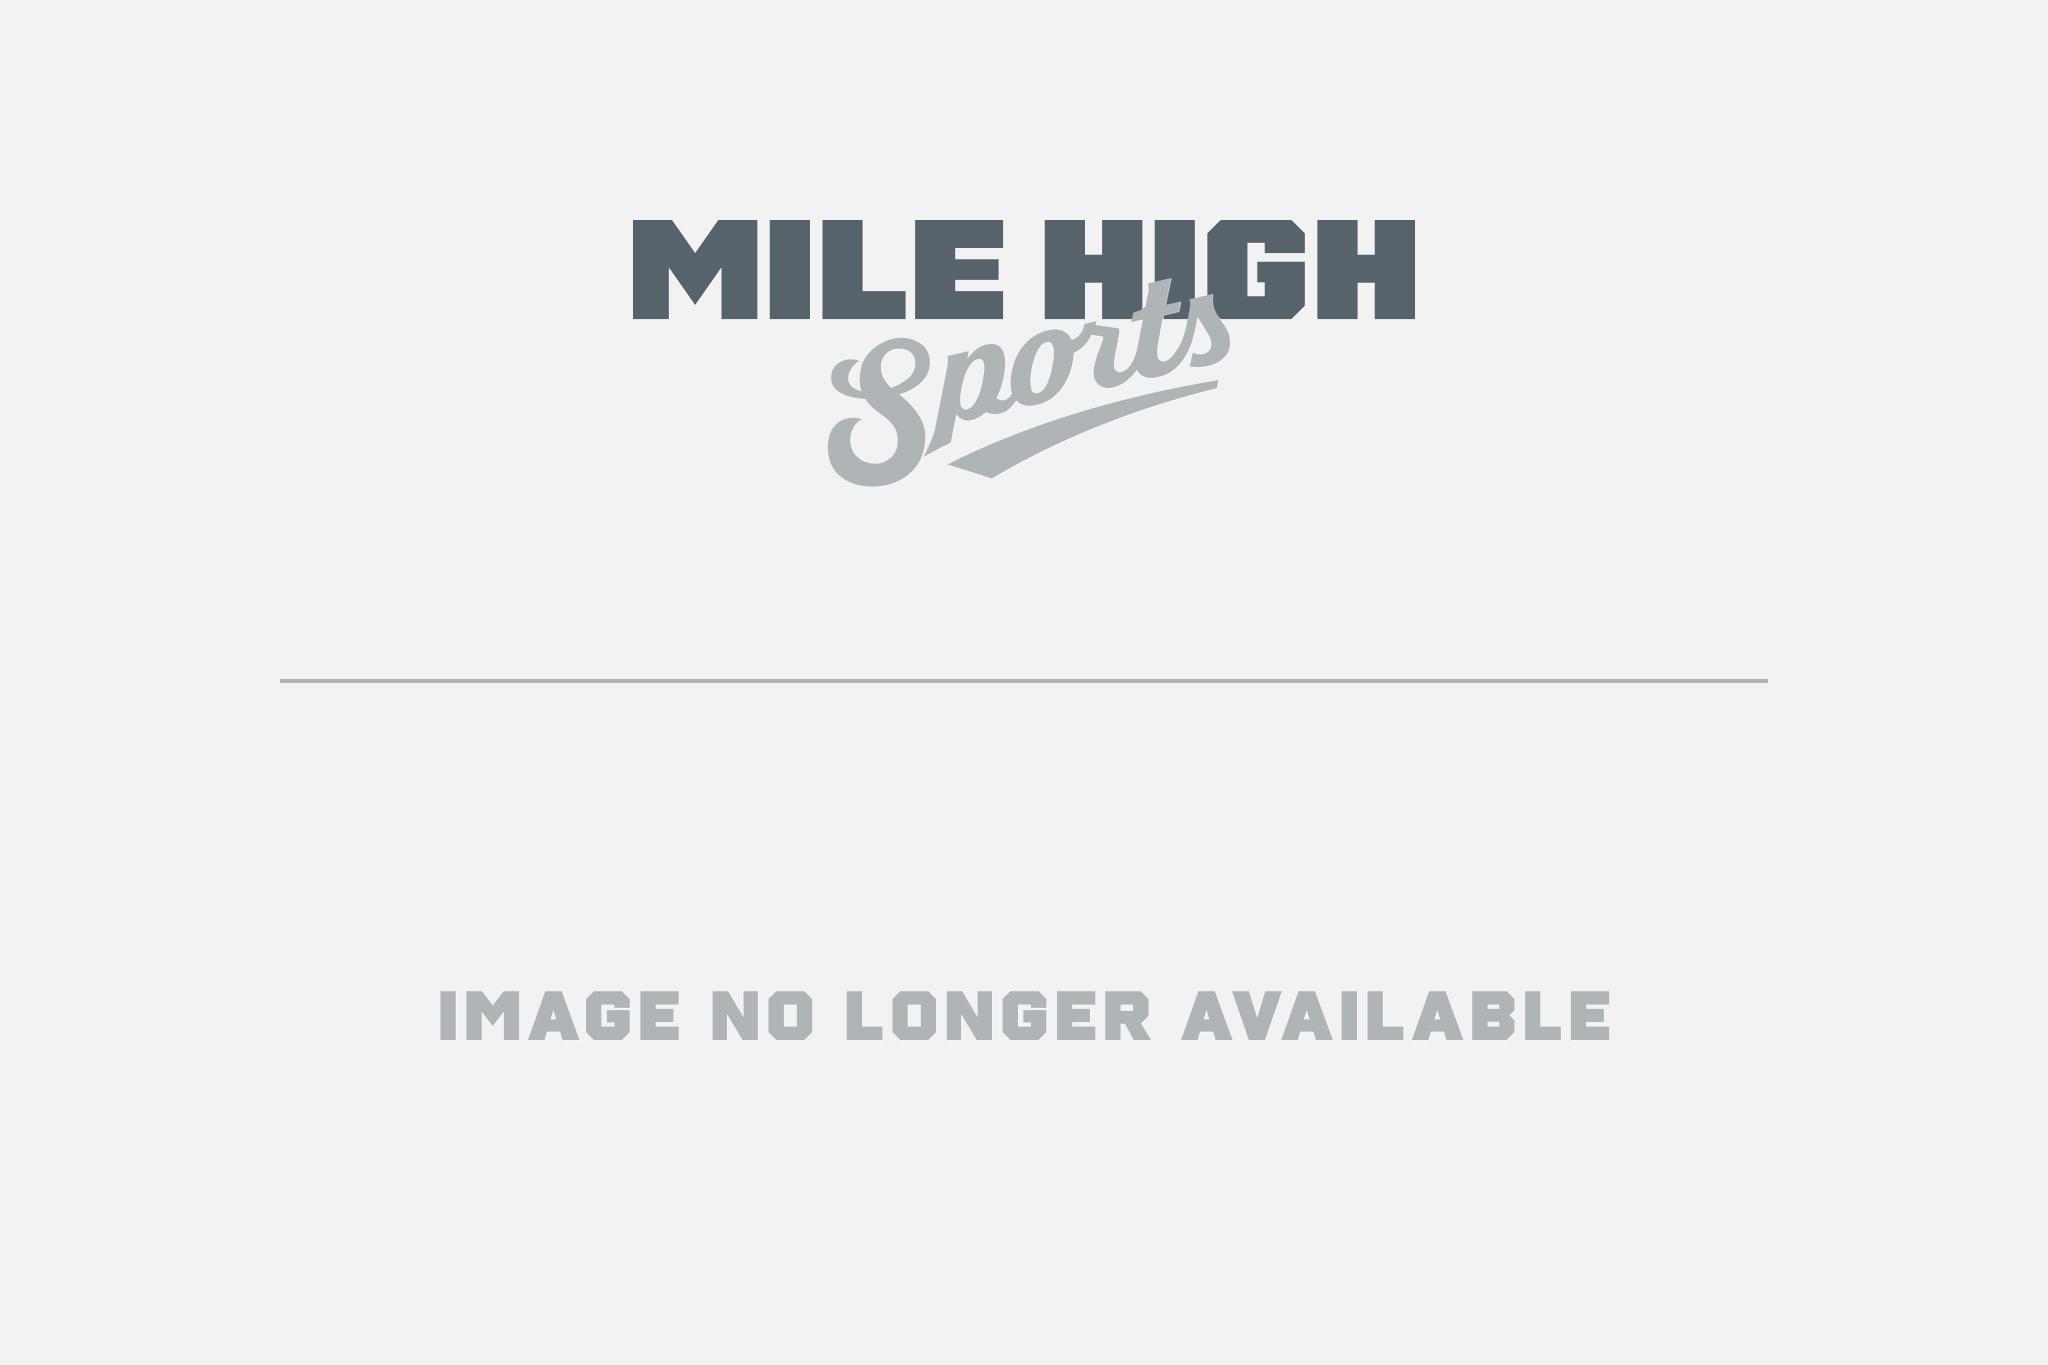 cover_contest